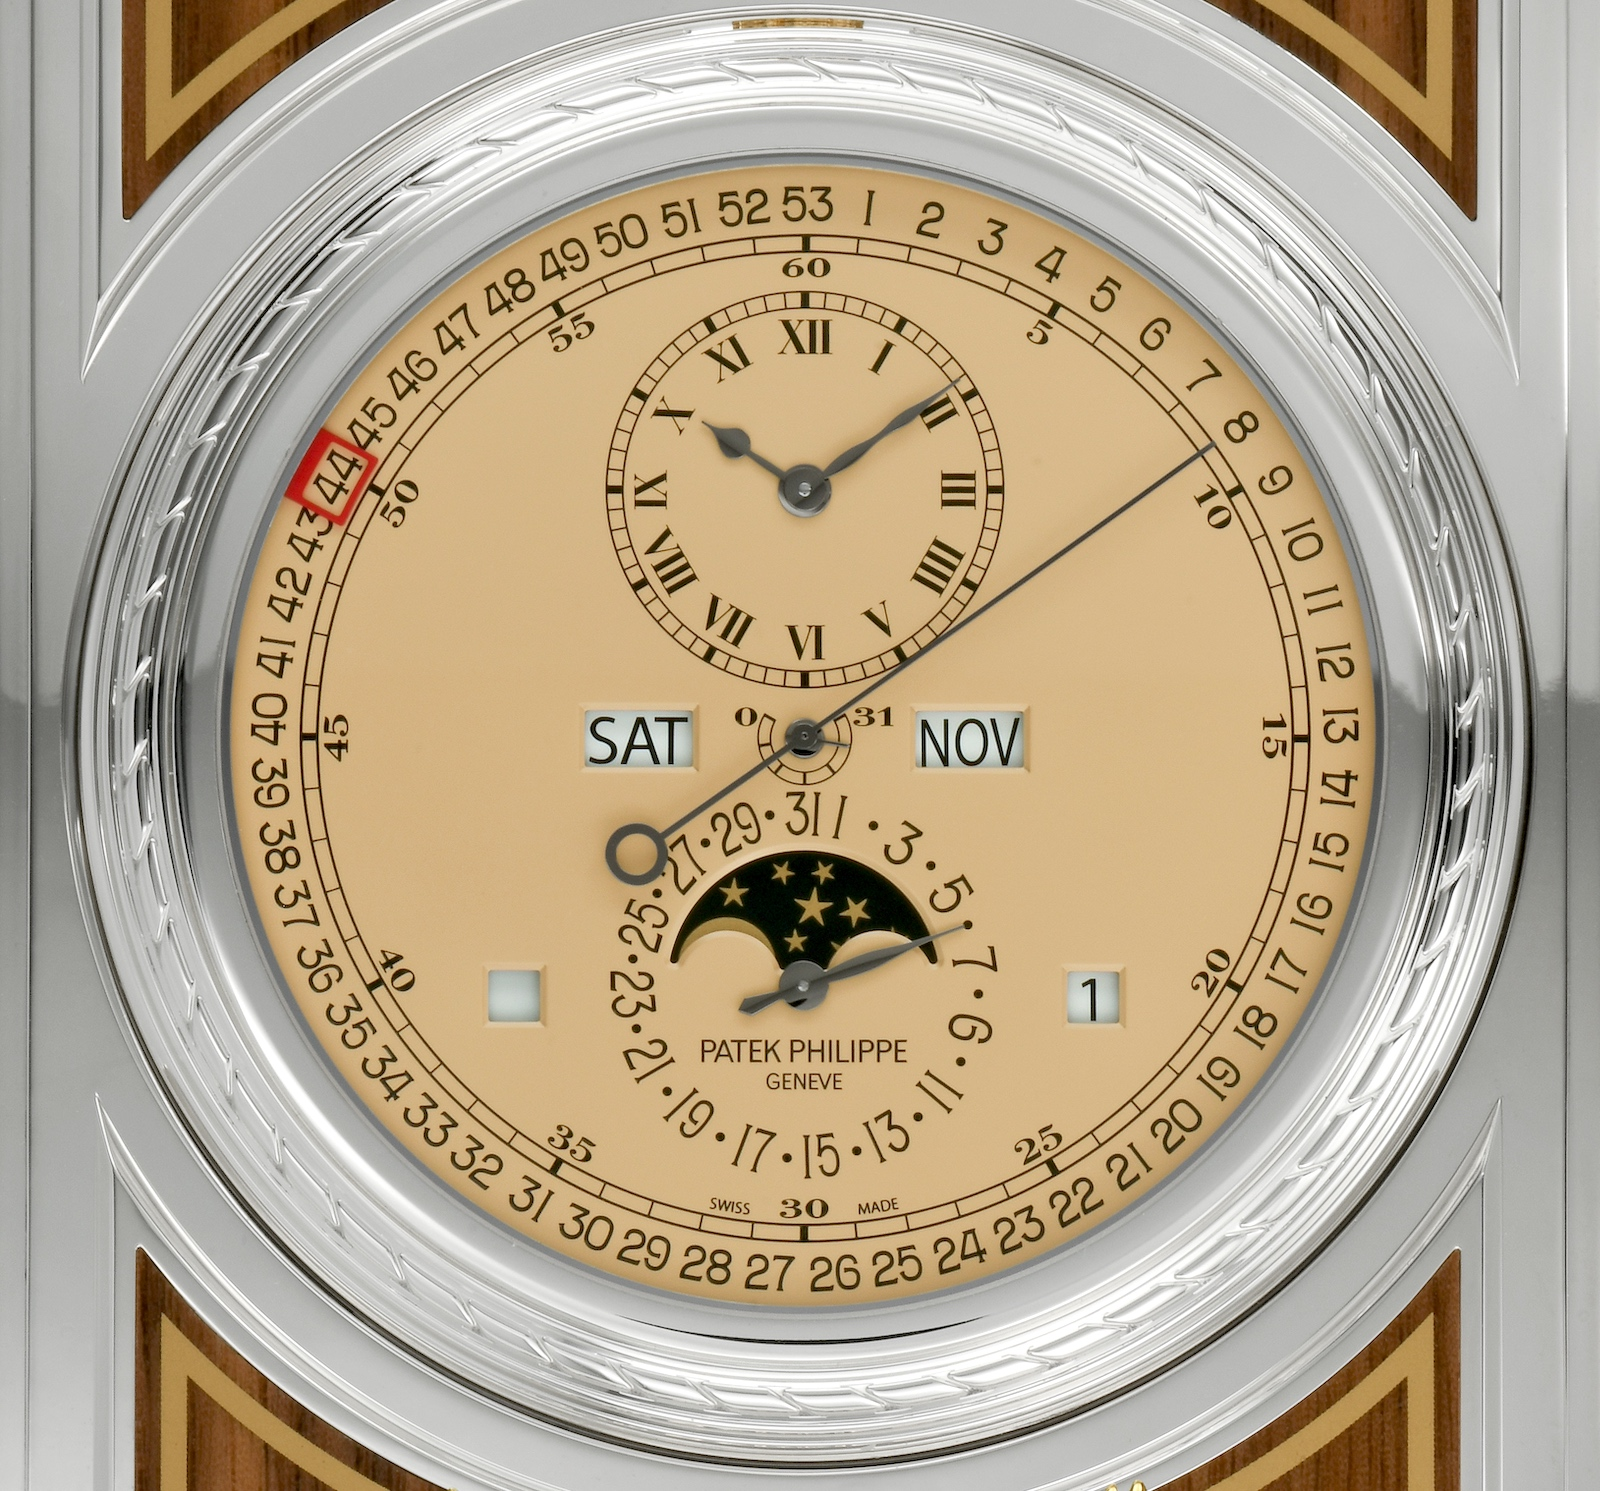 Patek Philippe Complicated Desk Clock 27001M-001 - esfera